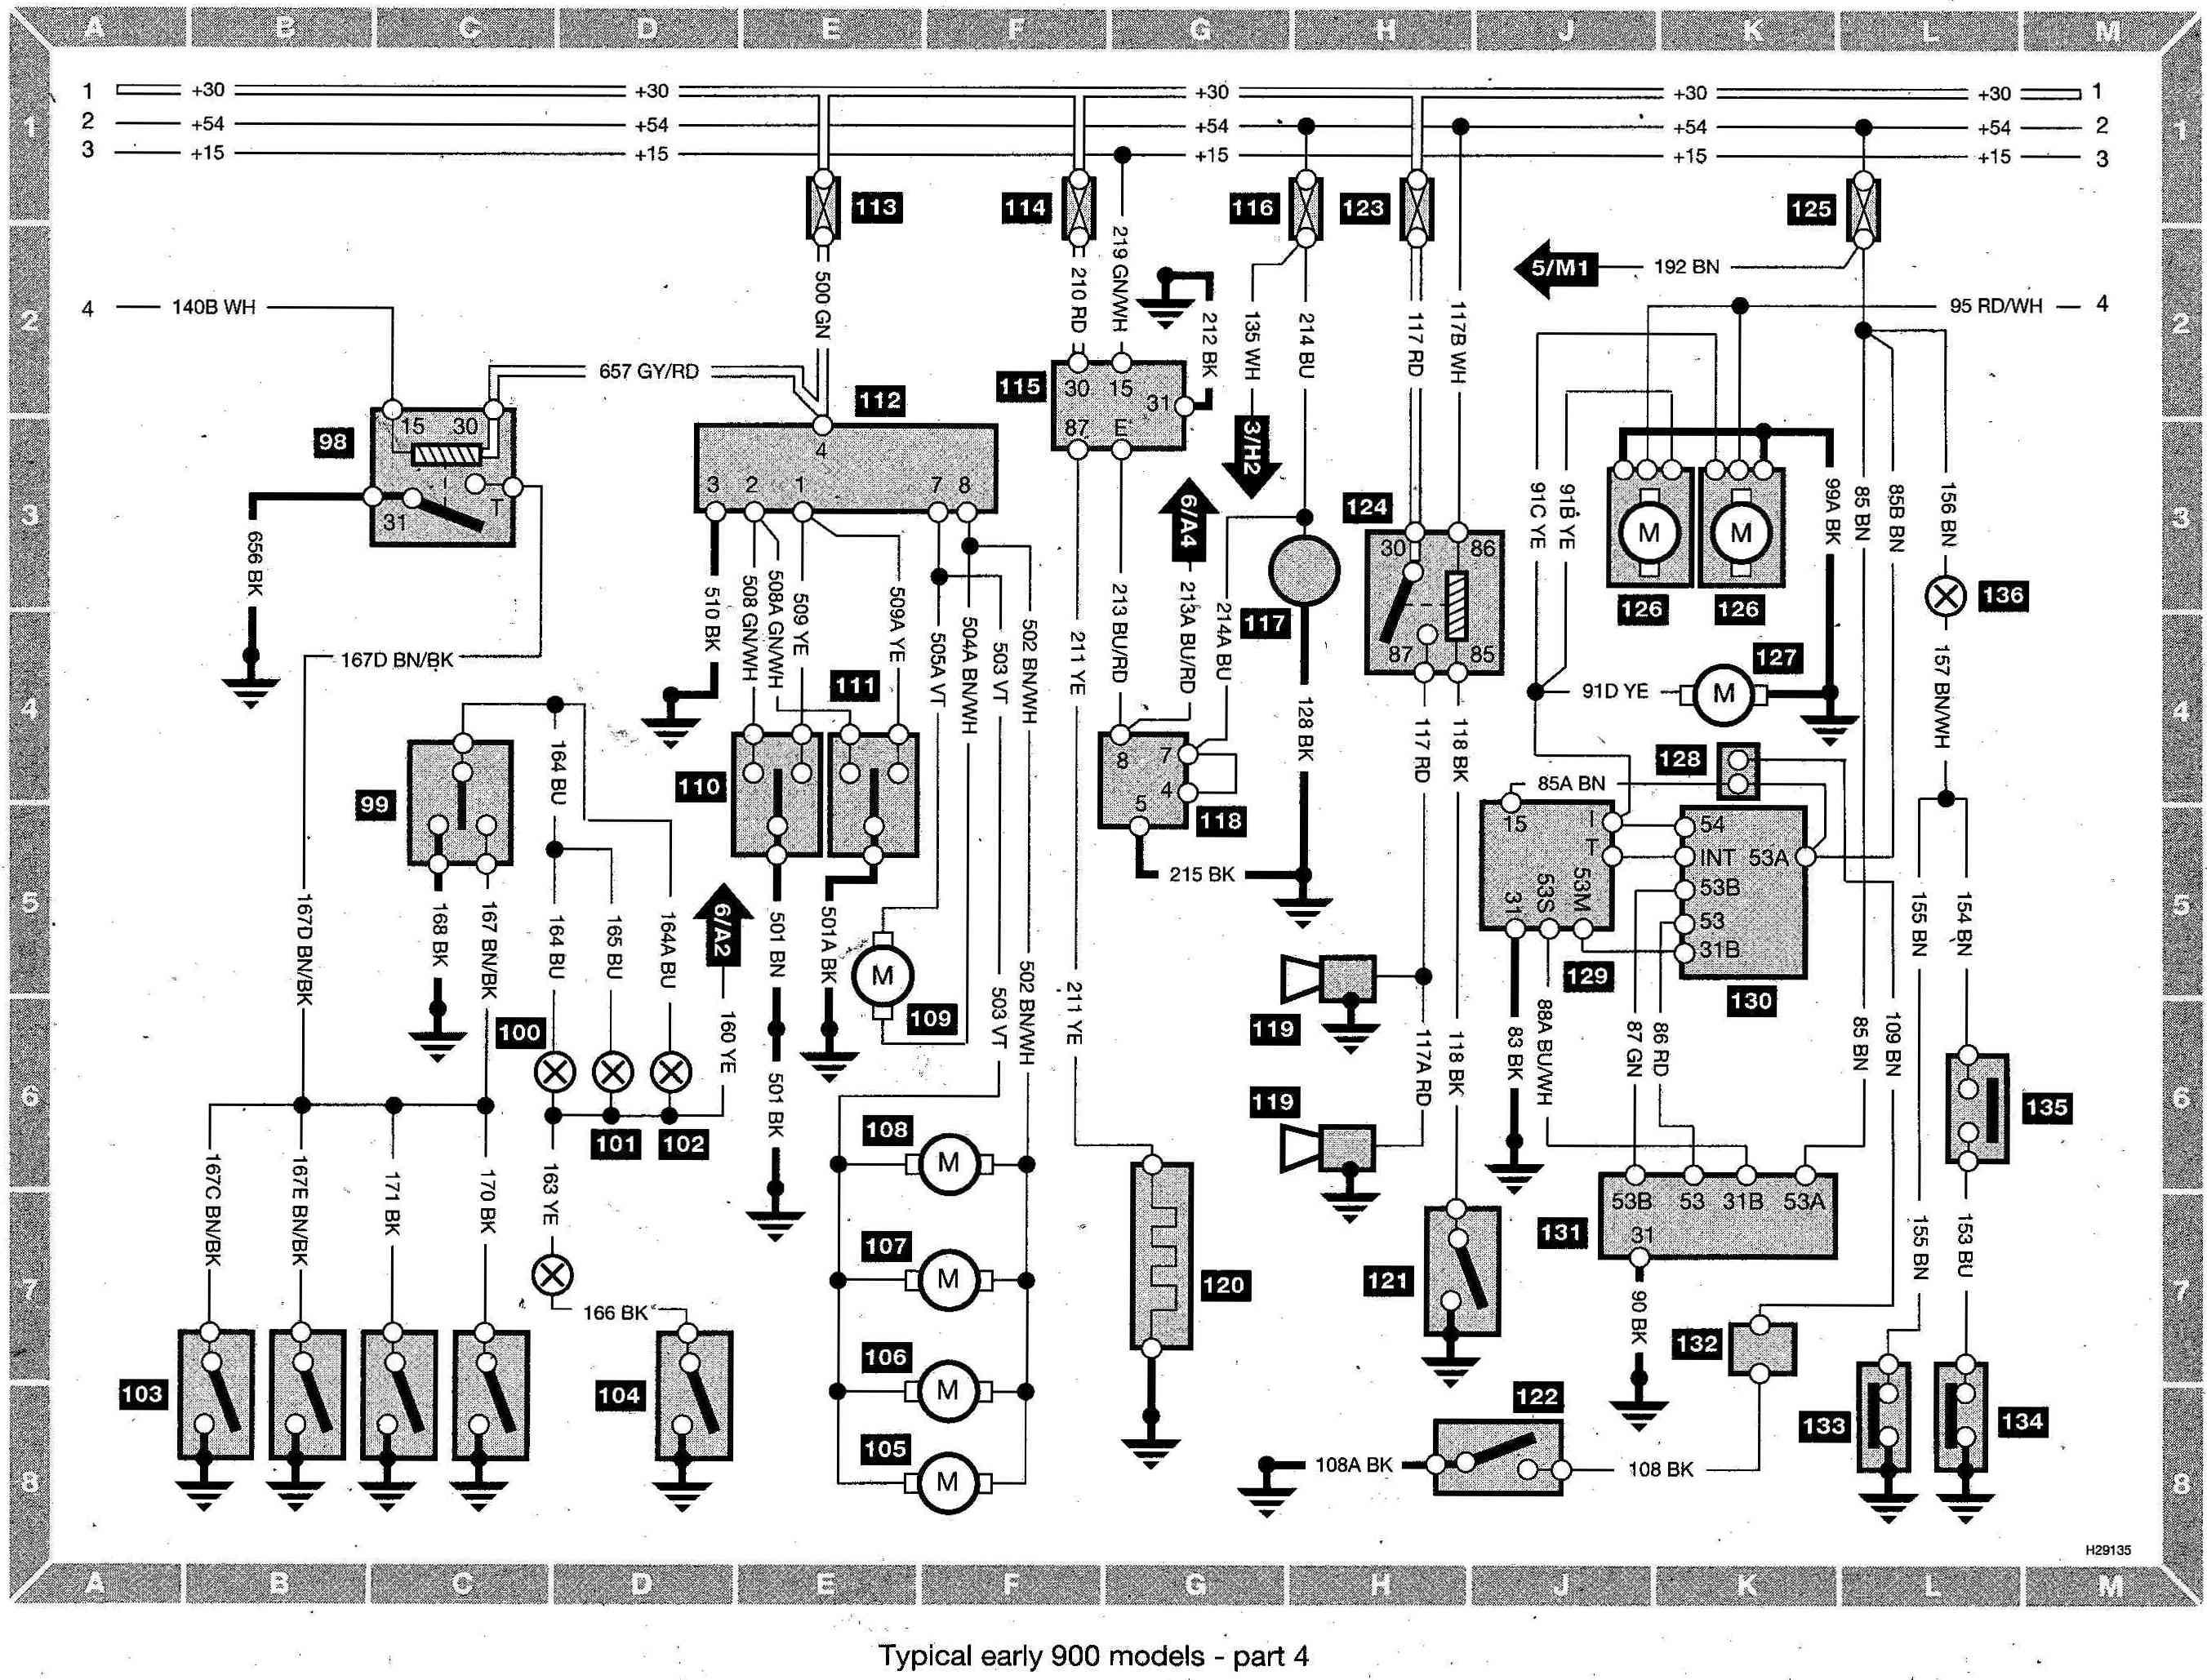 1997 Saab 900 Wiring Diagram - Wiring Diagrams Button belt-breed -  belt-breed.lamorciola.itbelt-breed.lamorciola.it